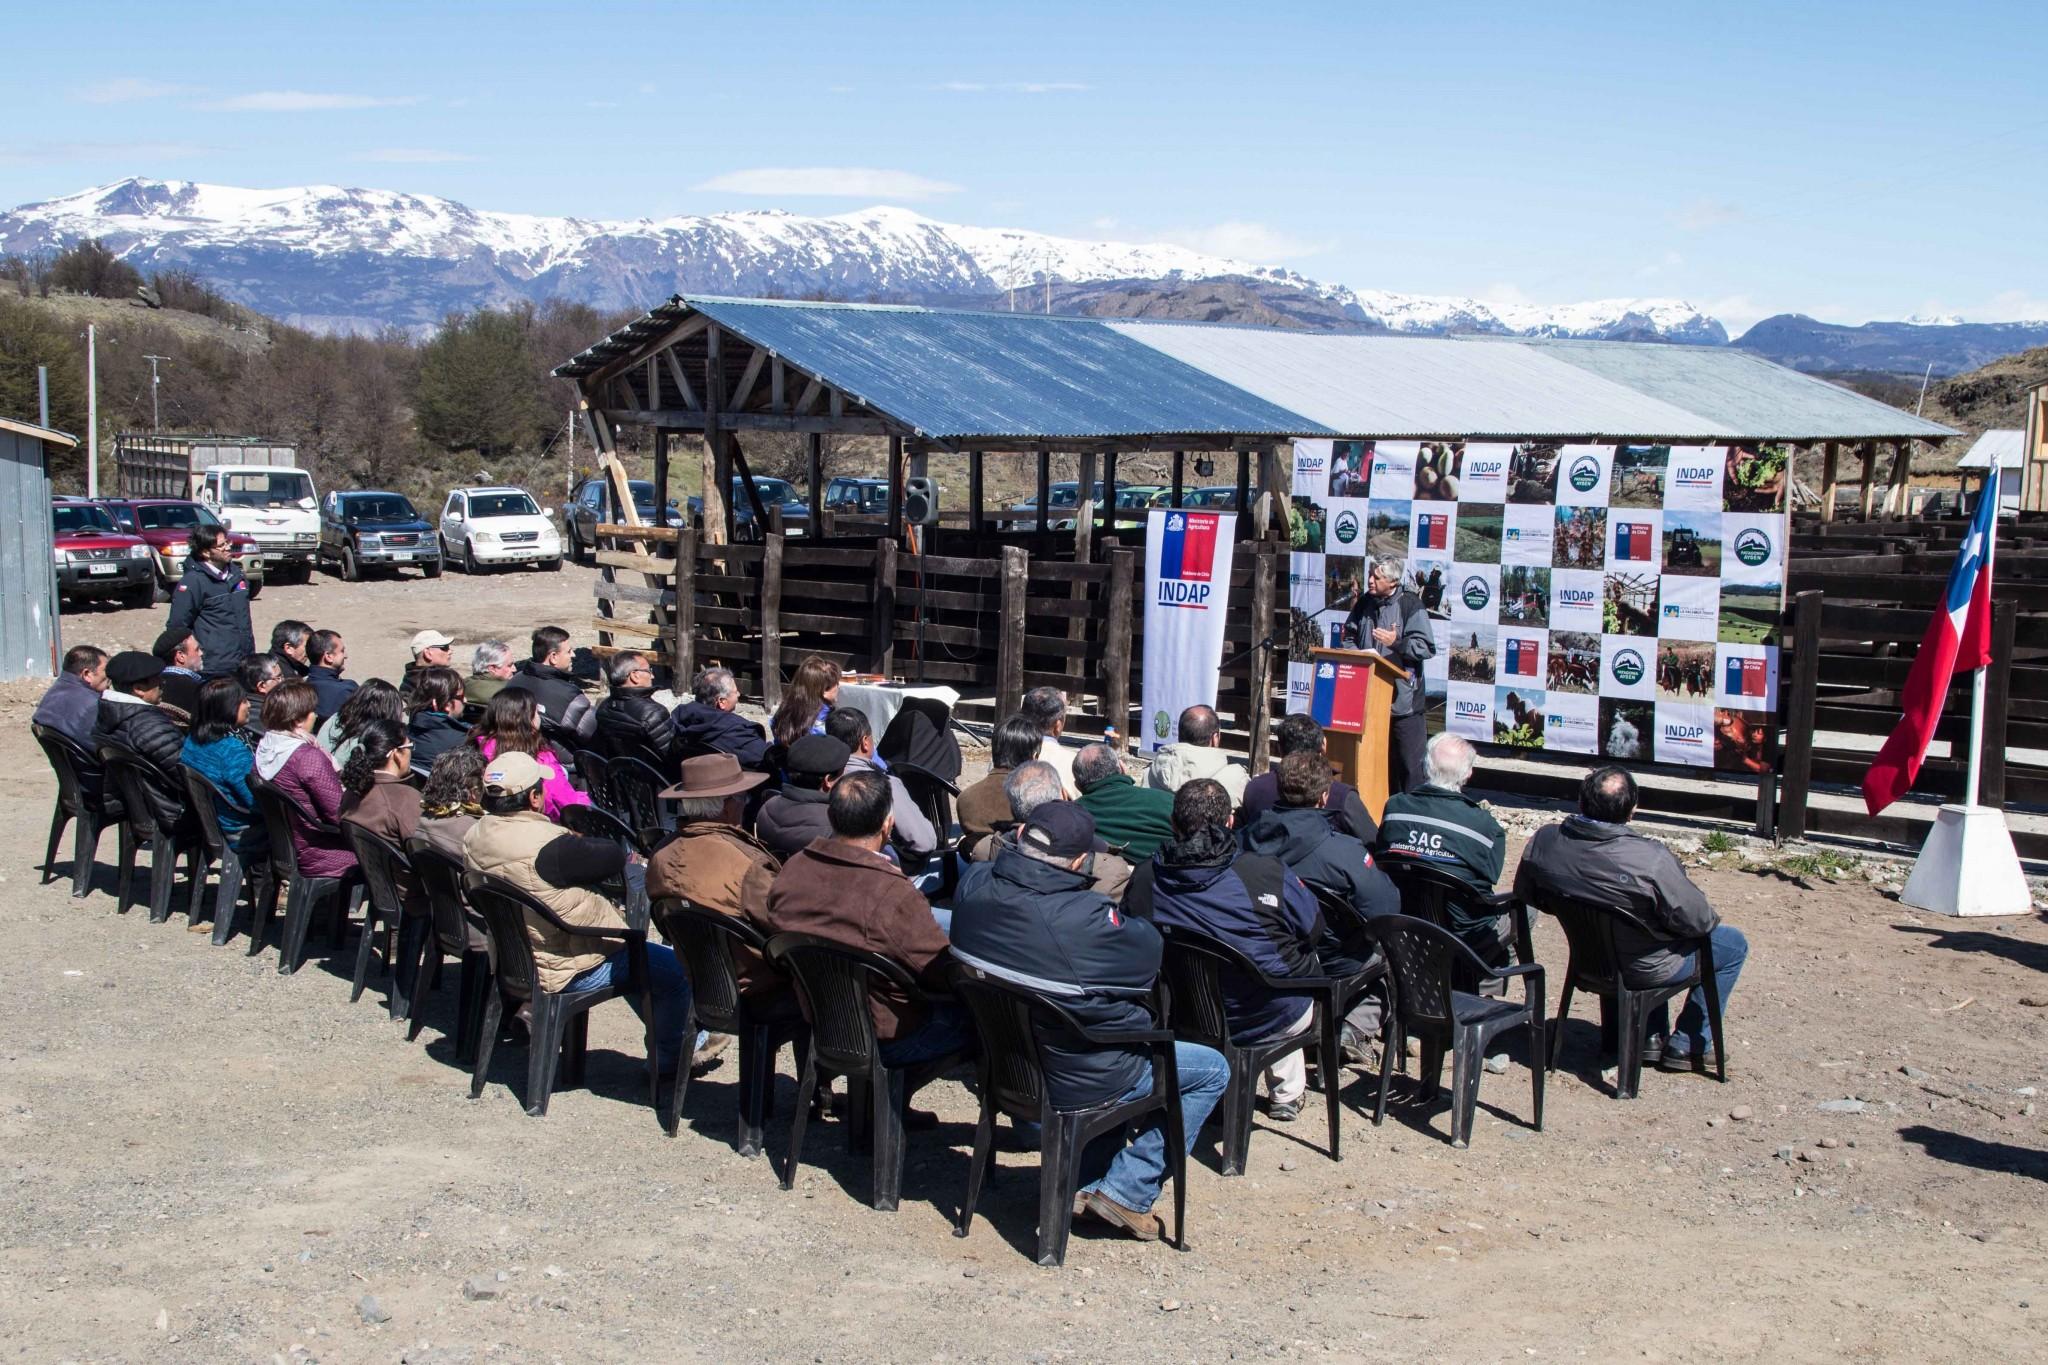 Planta faenadora de Aysén fue habilitada para exportar carne ovina a la Unión Europea